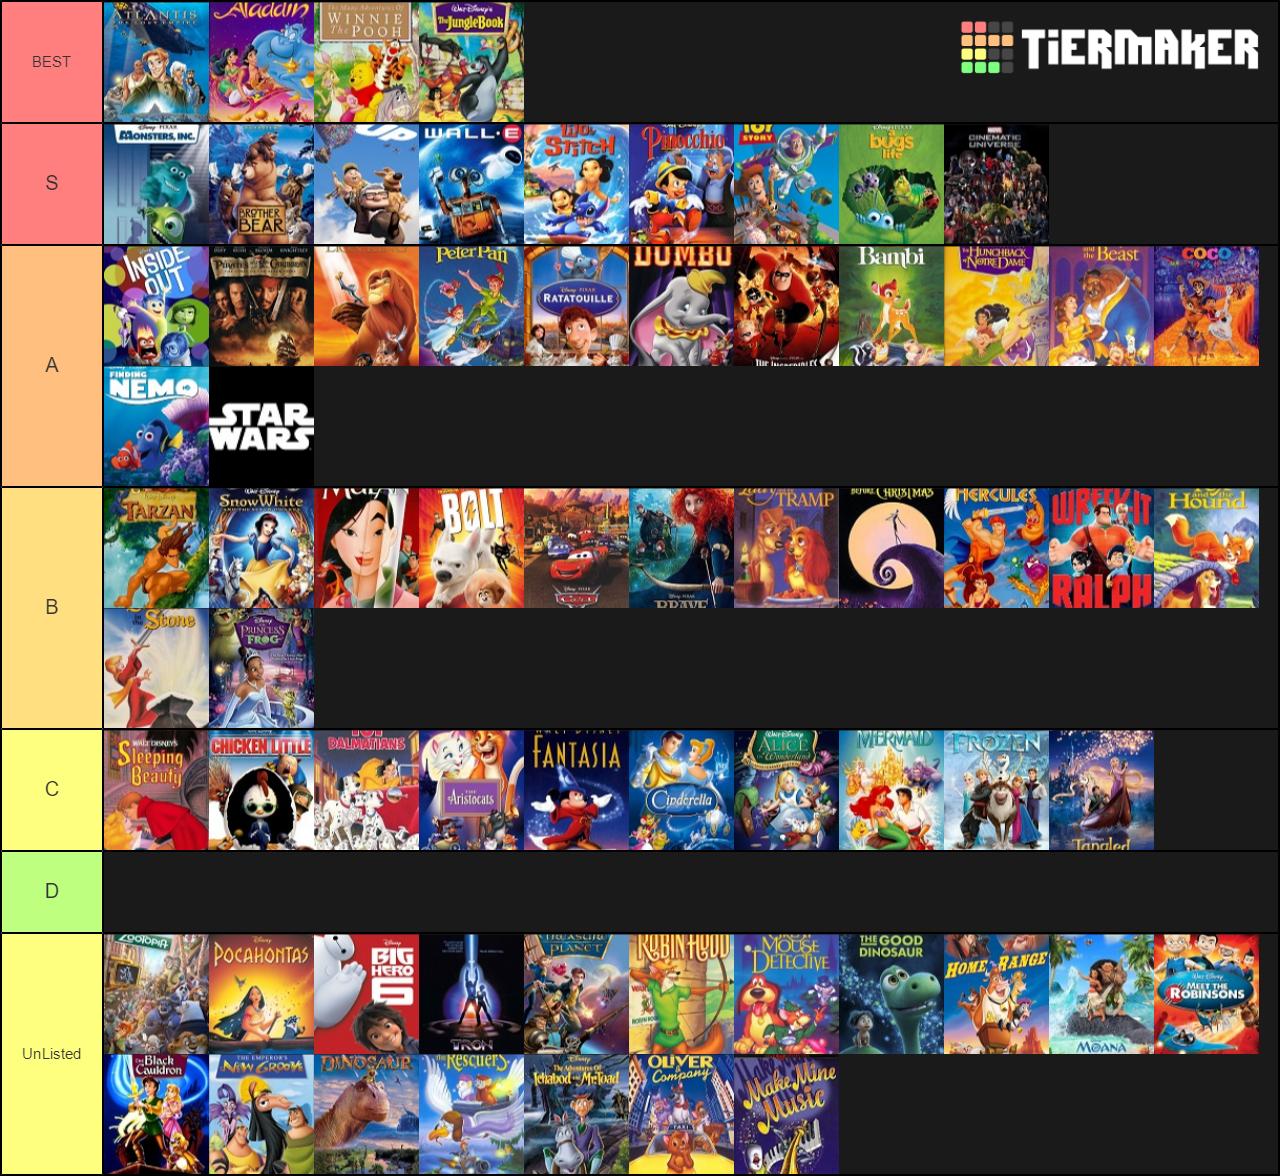 Liste Pixar Filme